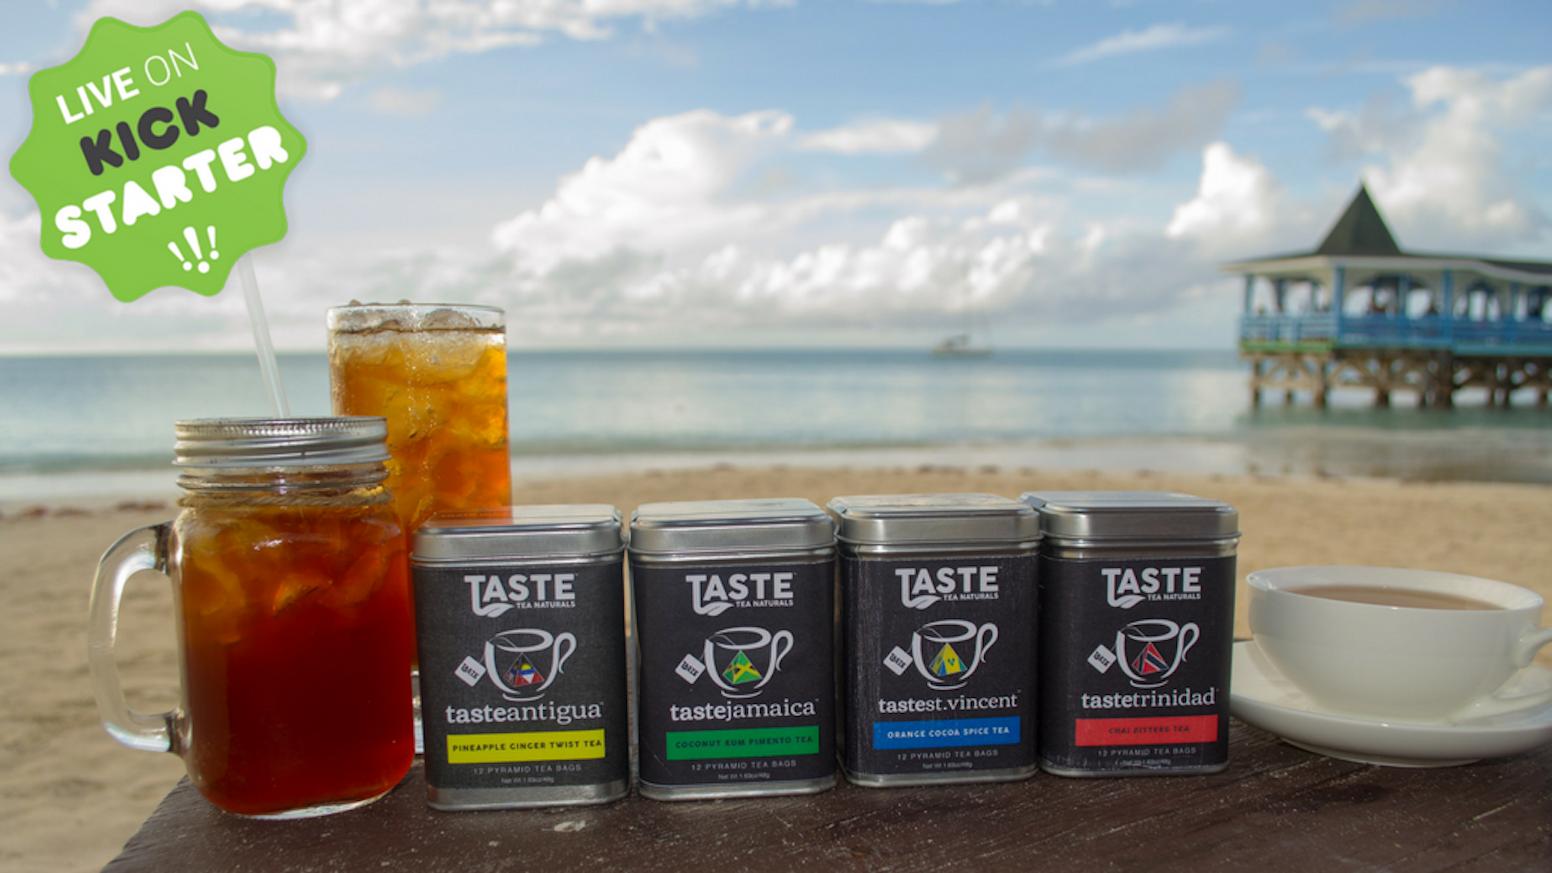 We're not your grandma's tea | Taste Tea Naturals by Natalie